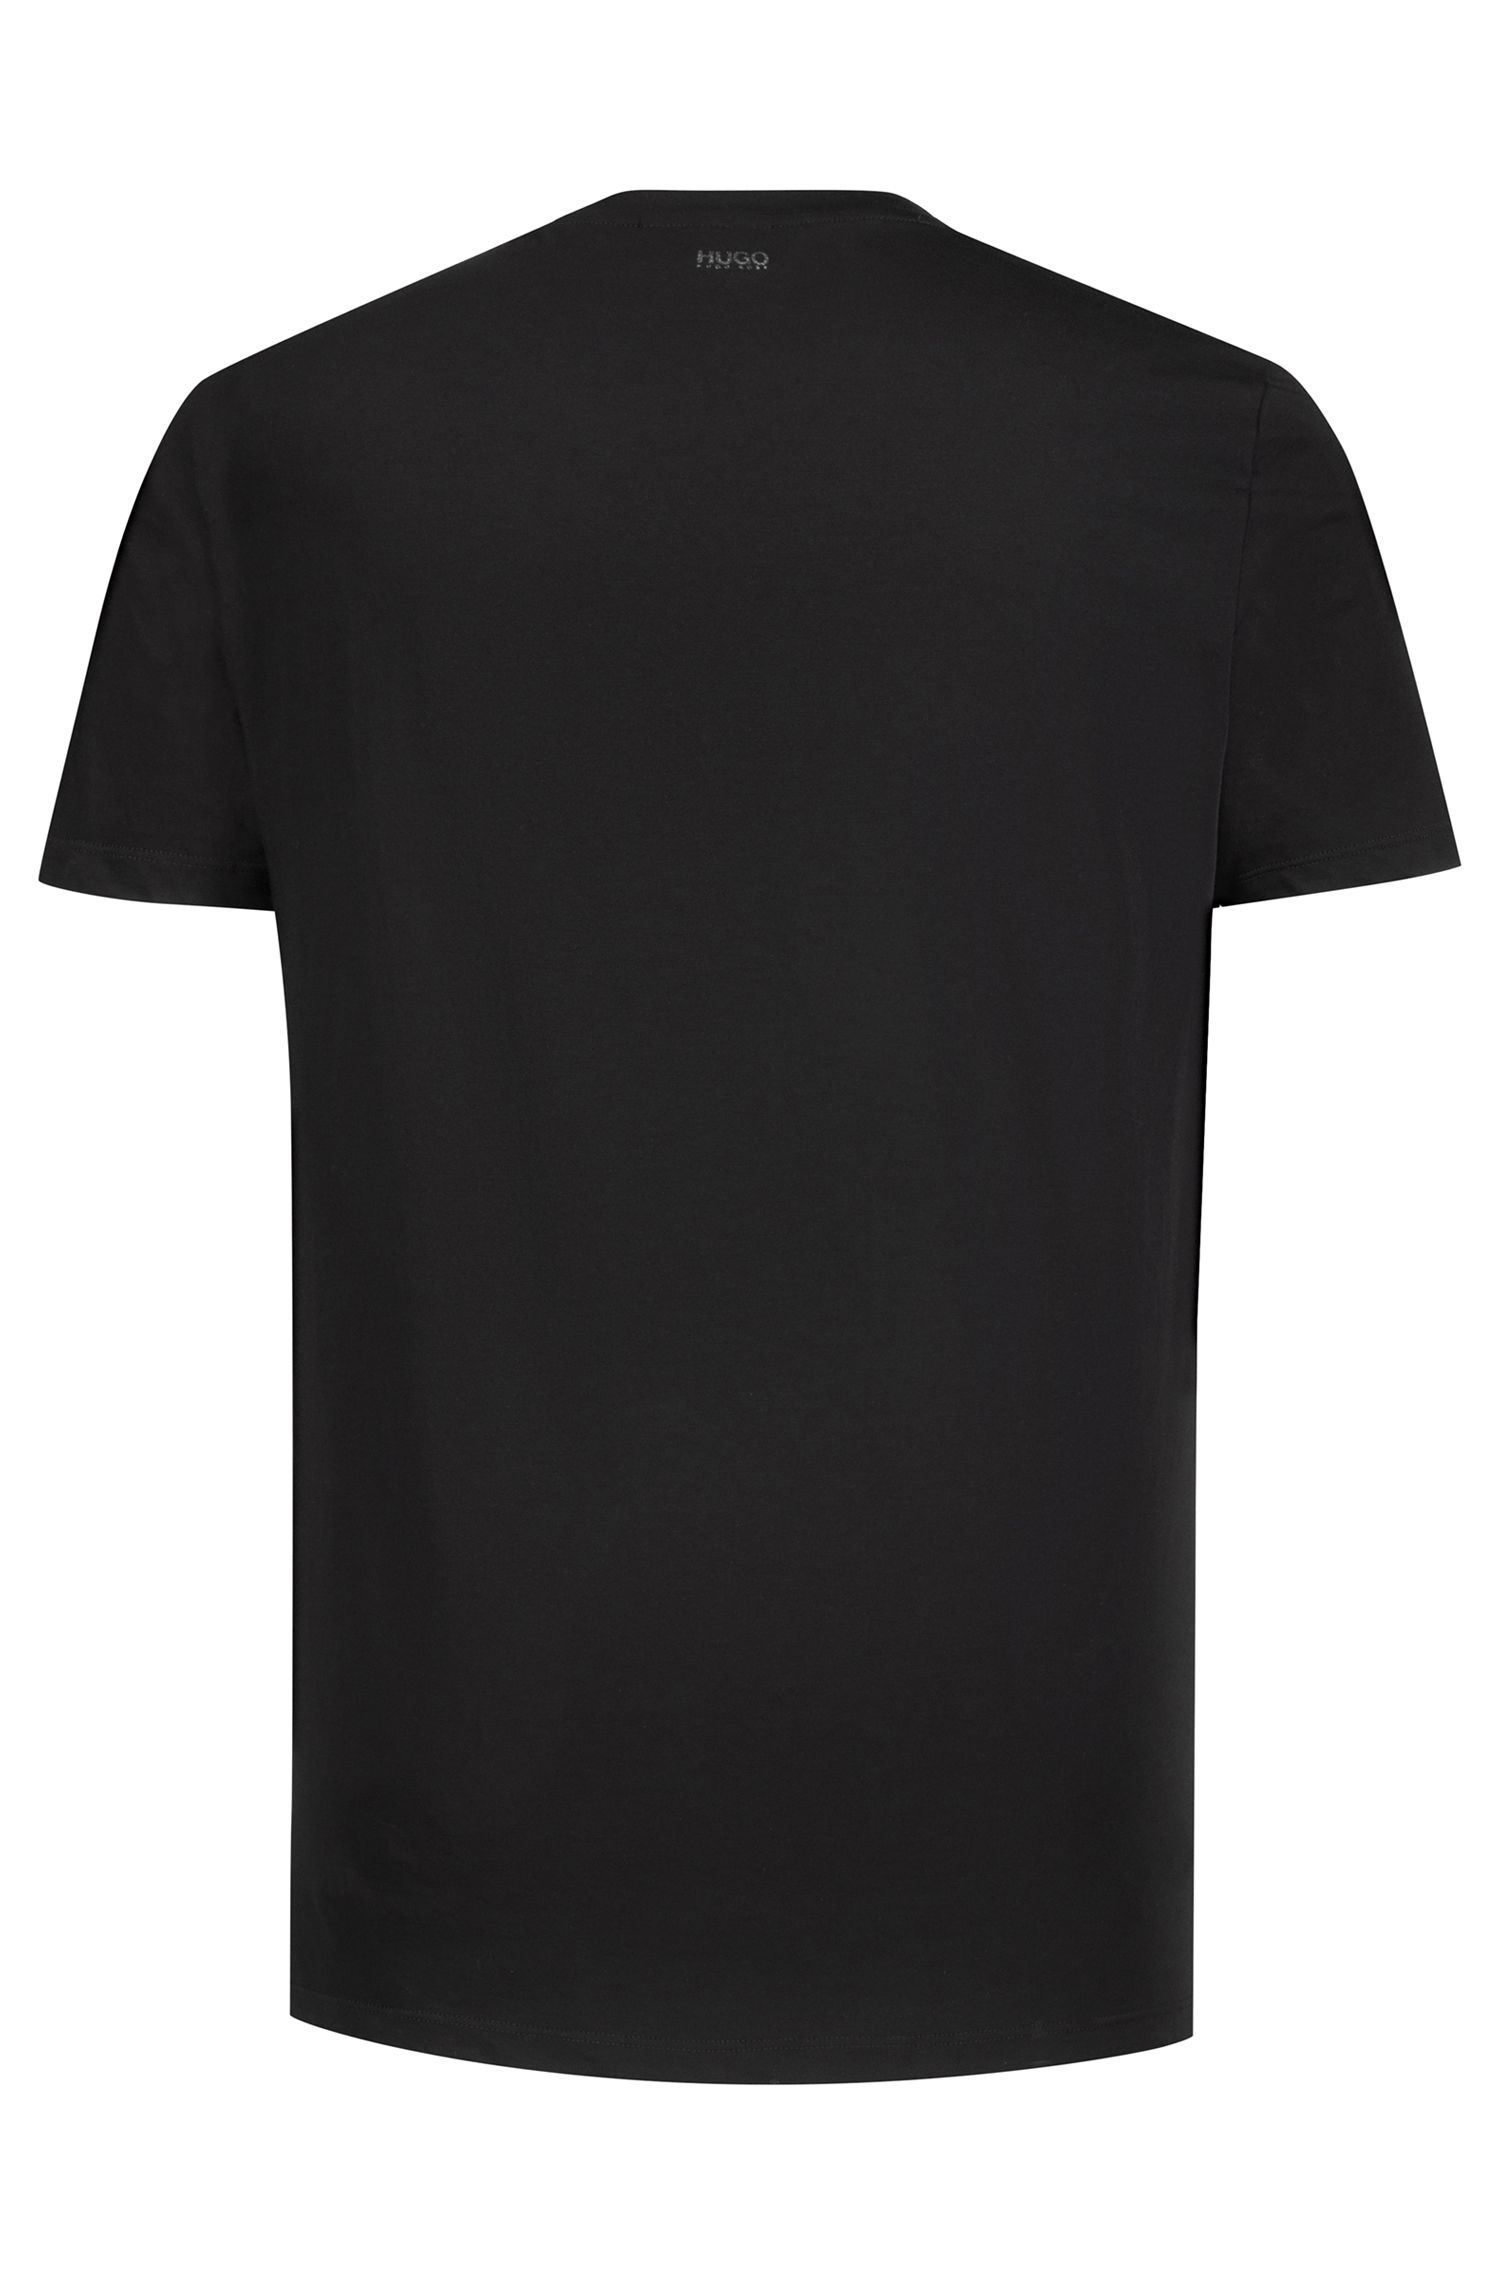 Single-jersey T-shirt with printed metallic slogan